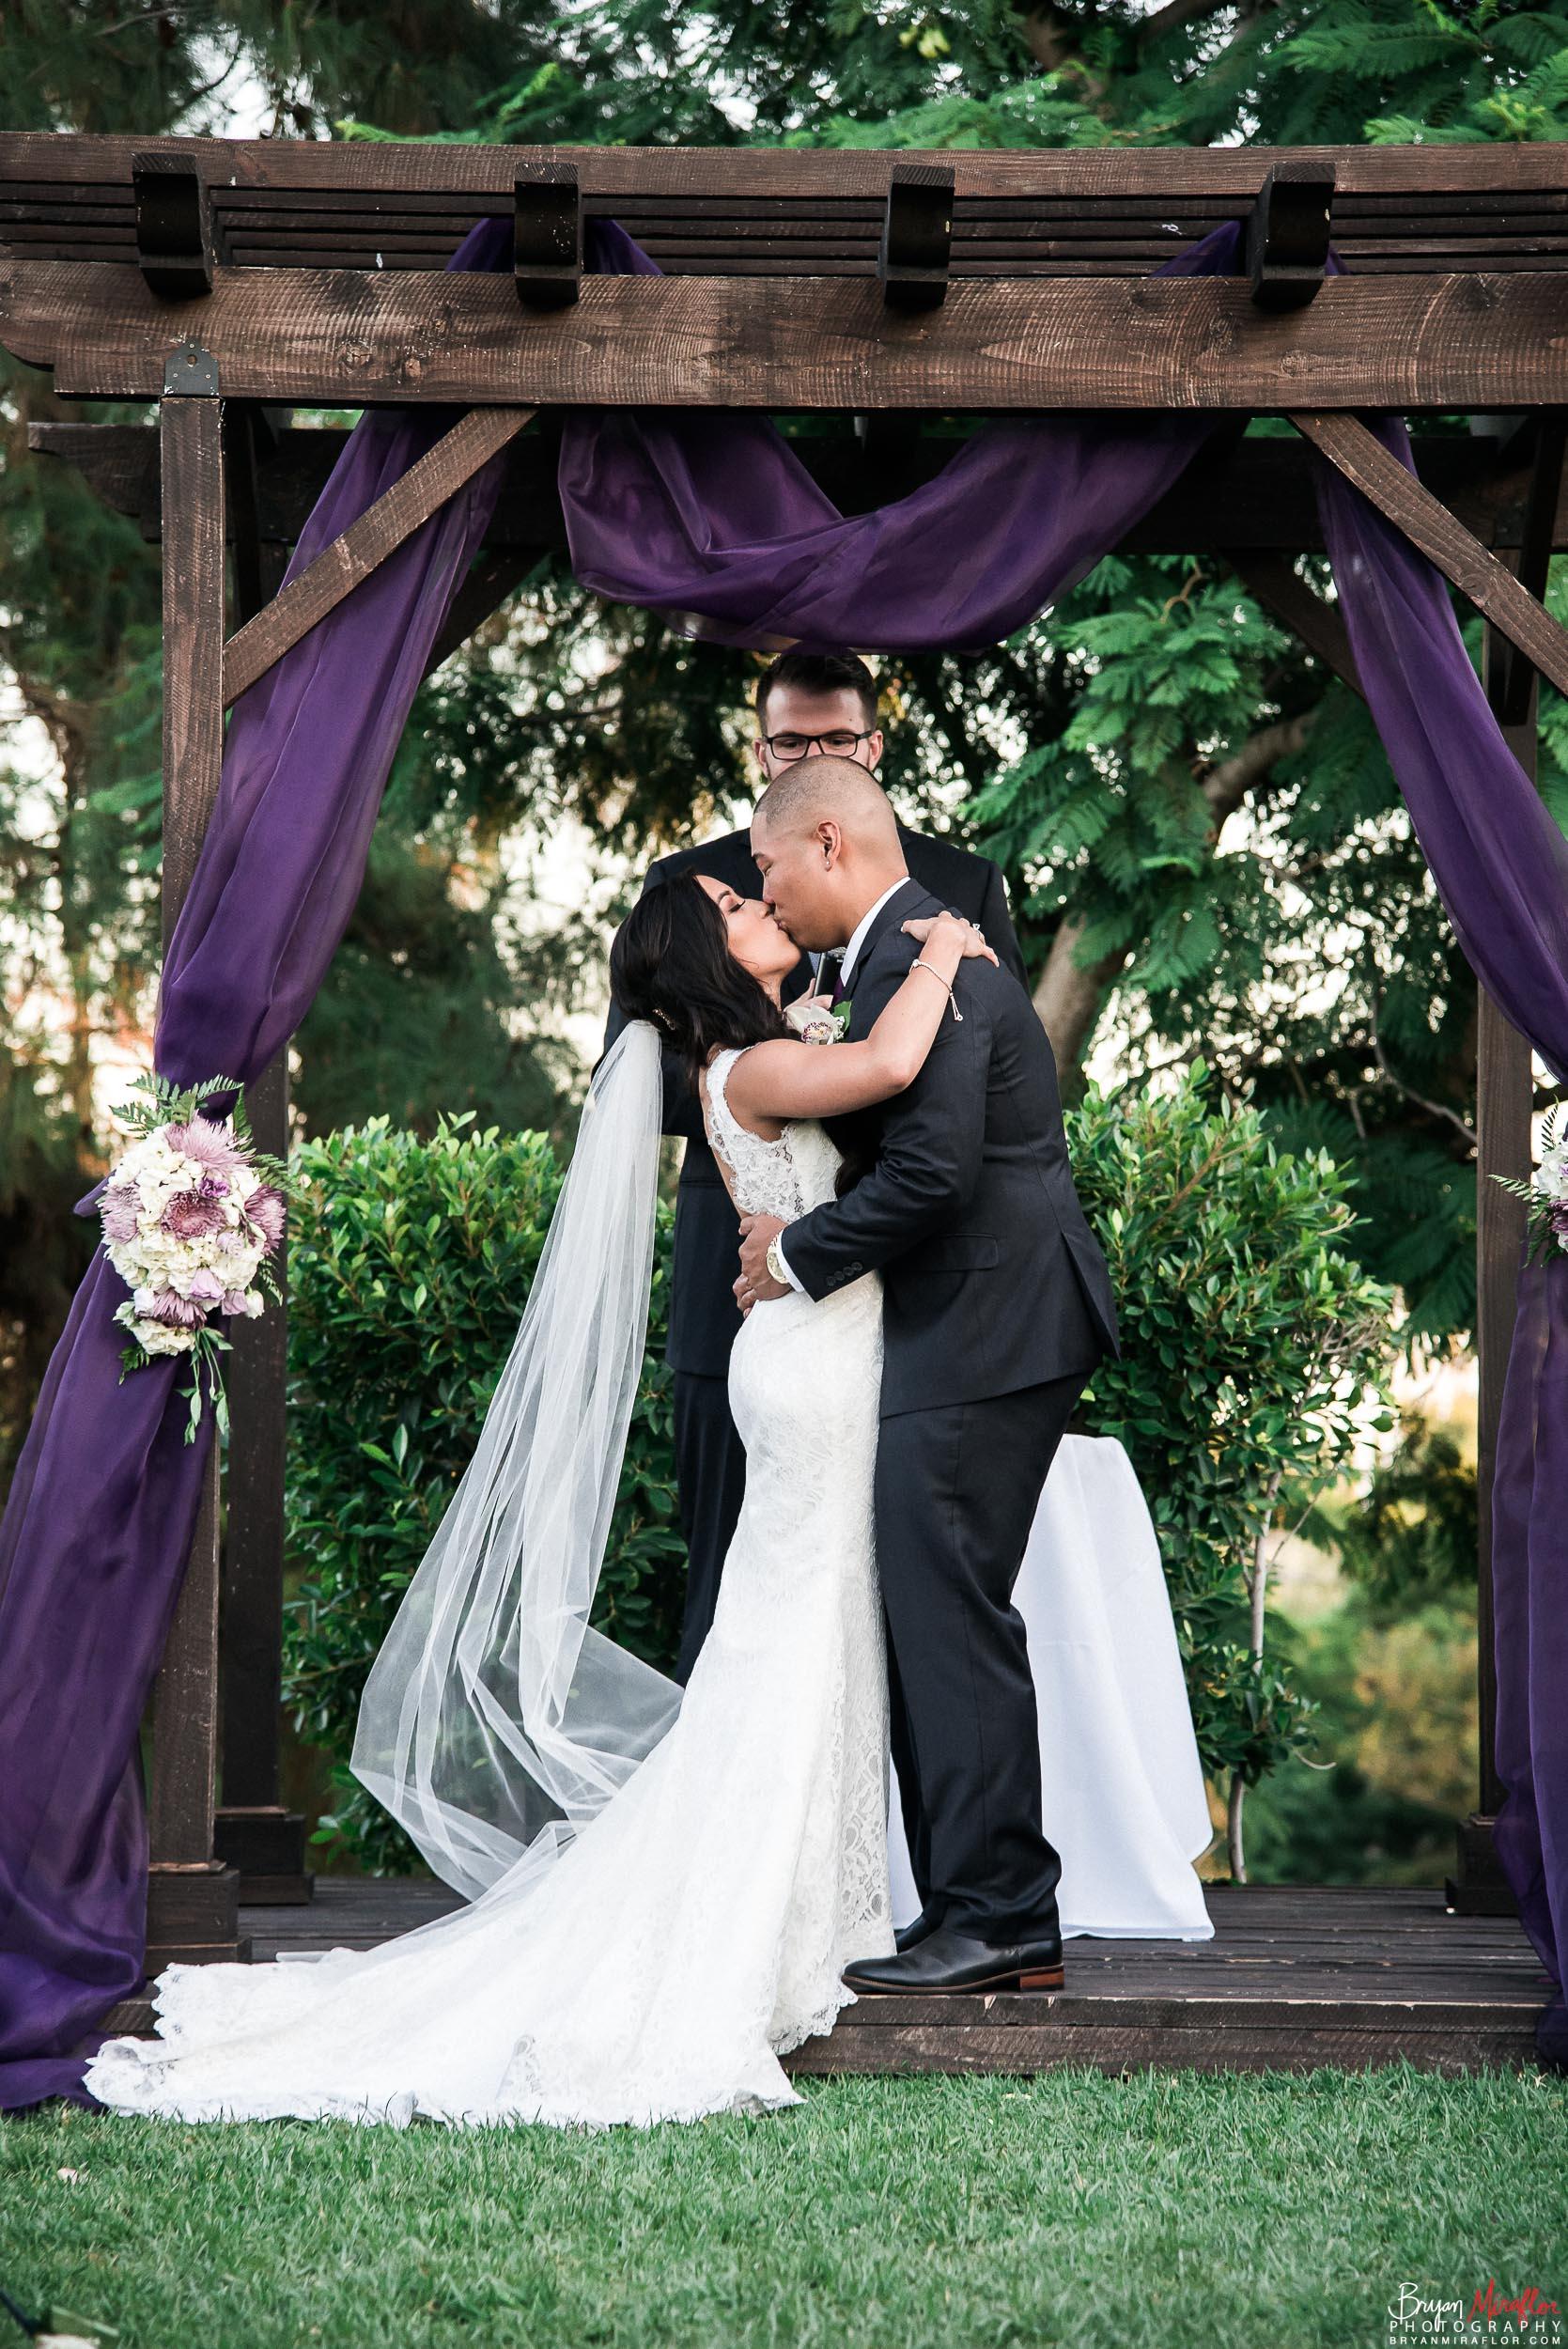 Bryan-Miraflor-Photography-Trisha-Dexter-Married-20170923-055.jpg